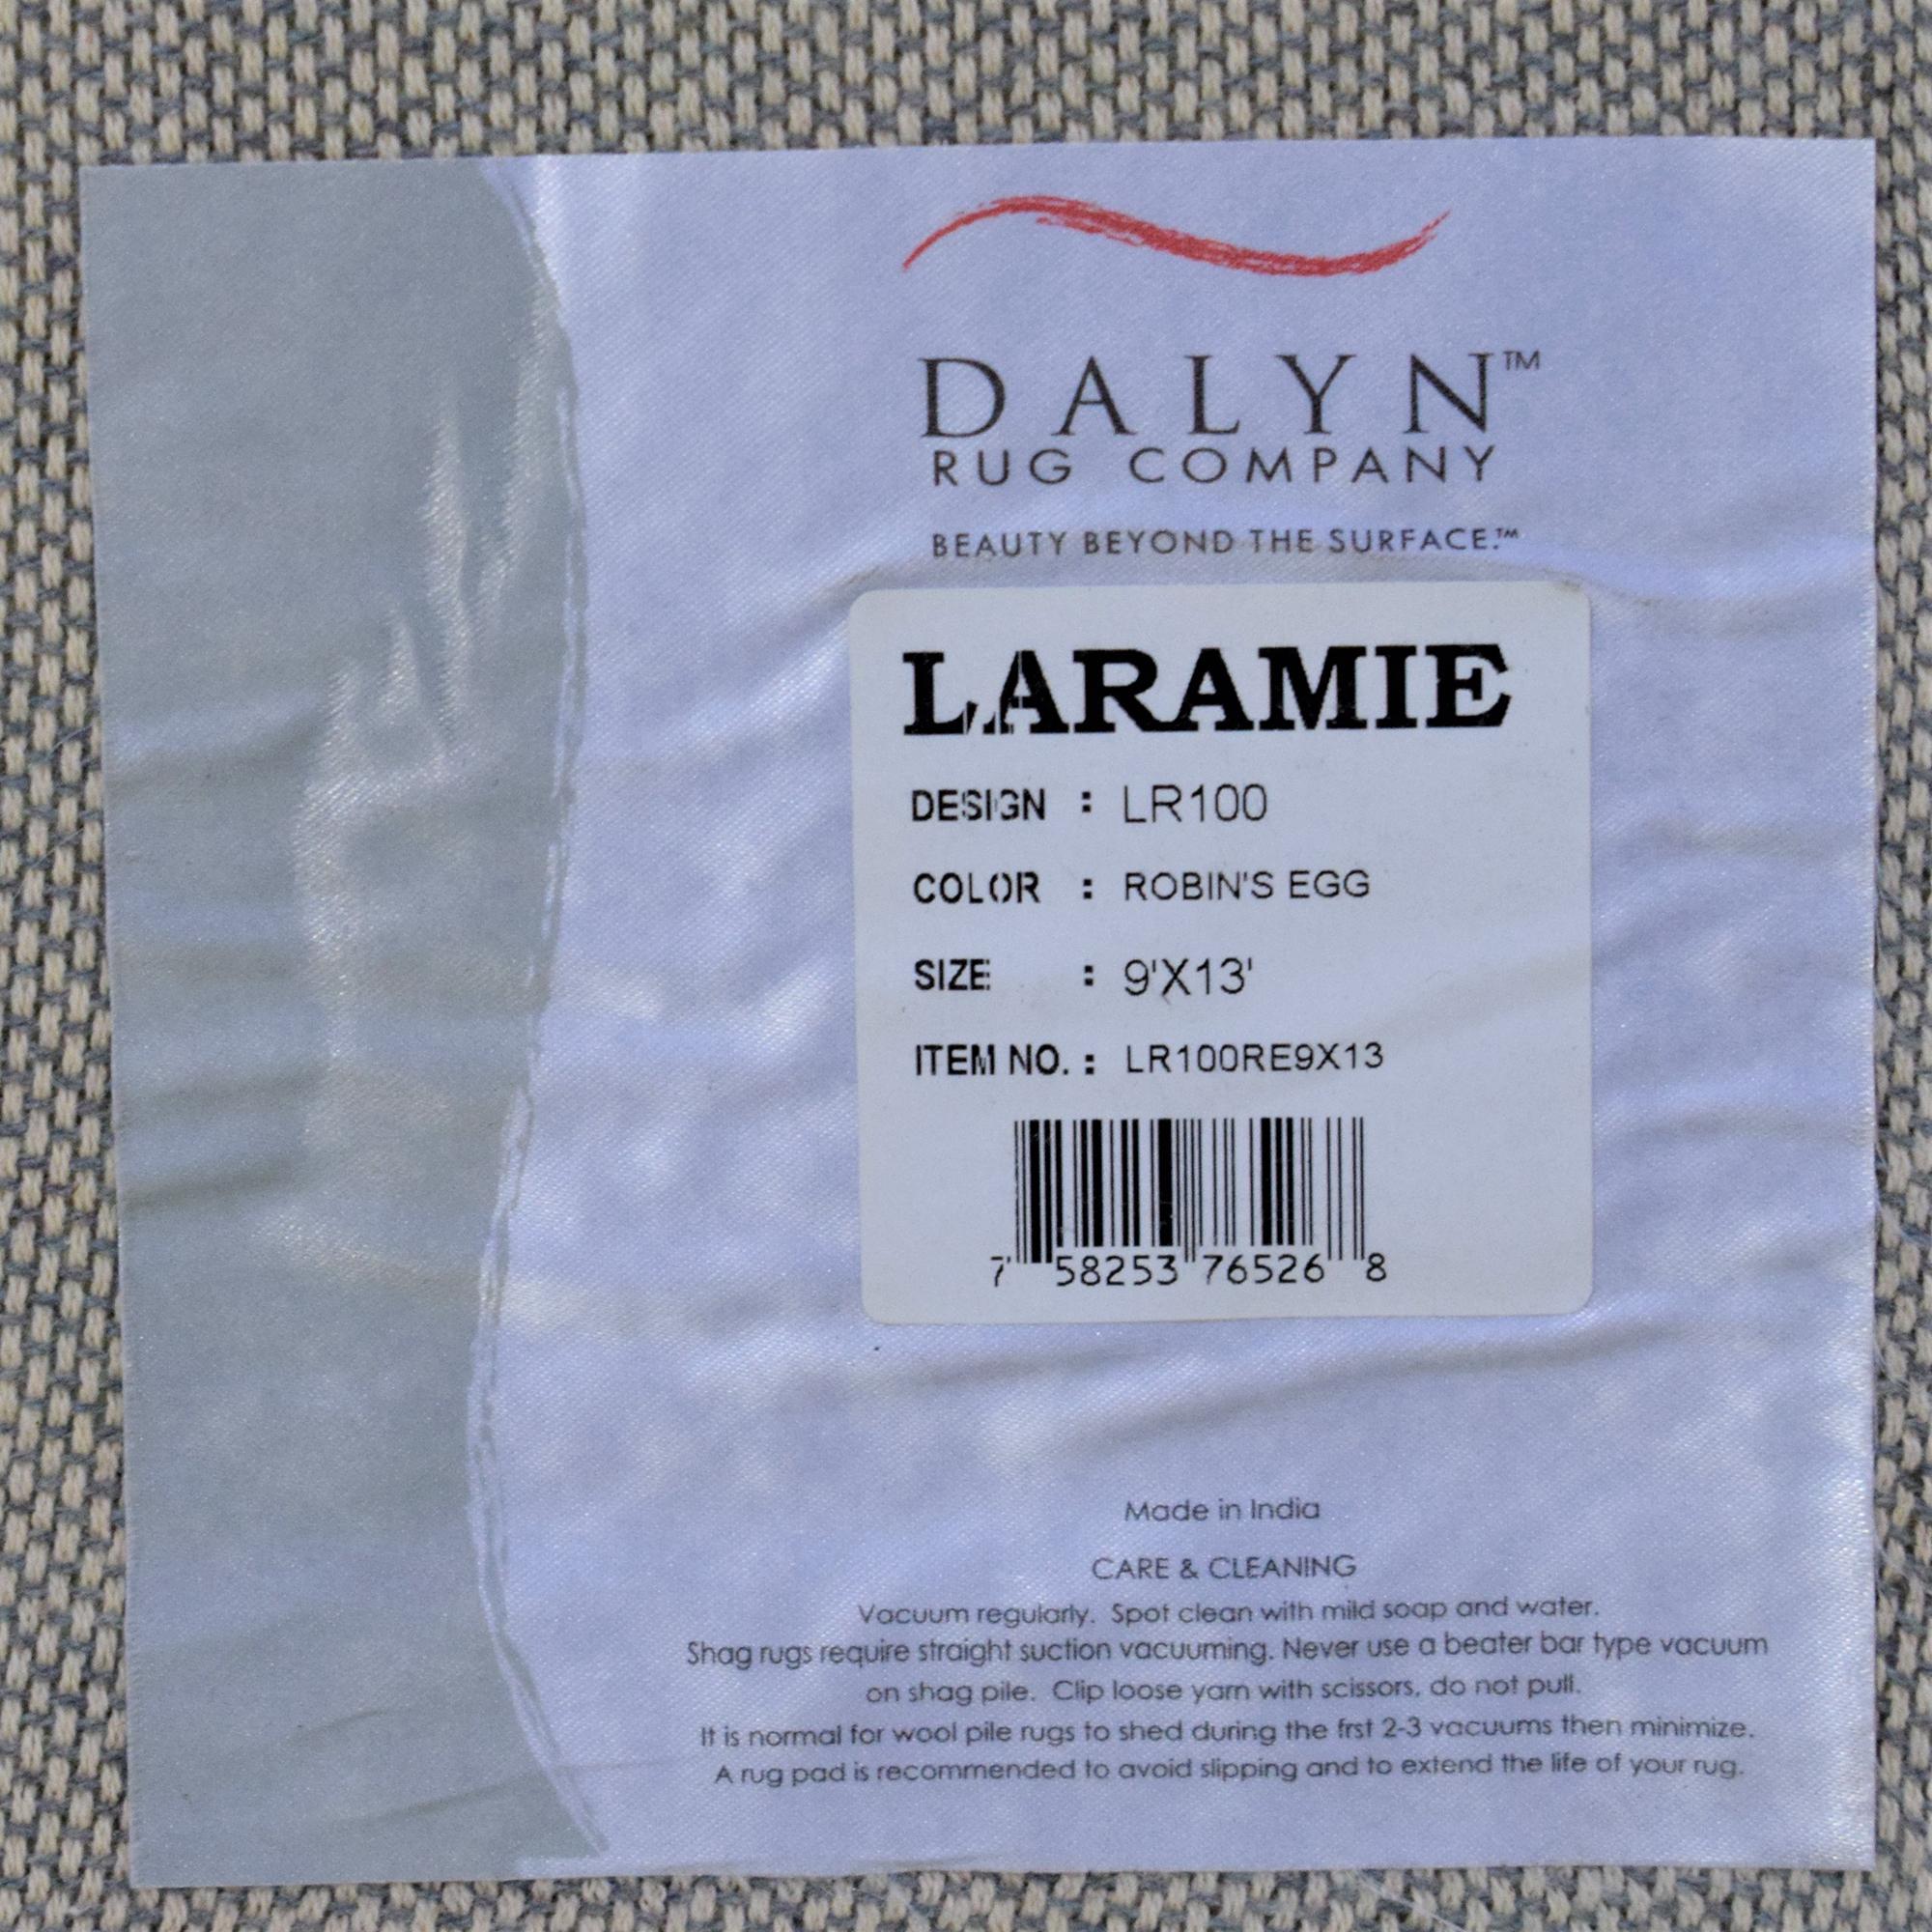 Dalyn Rug Company Laramie Area